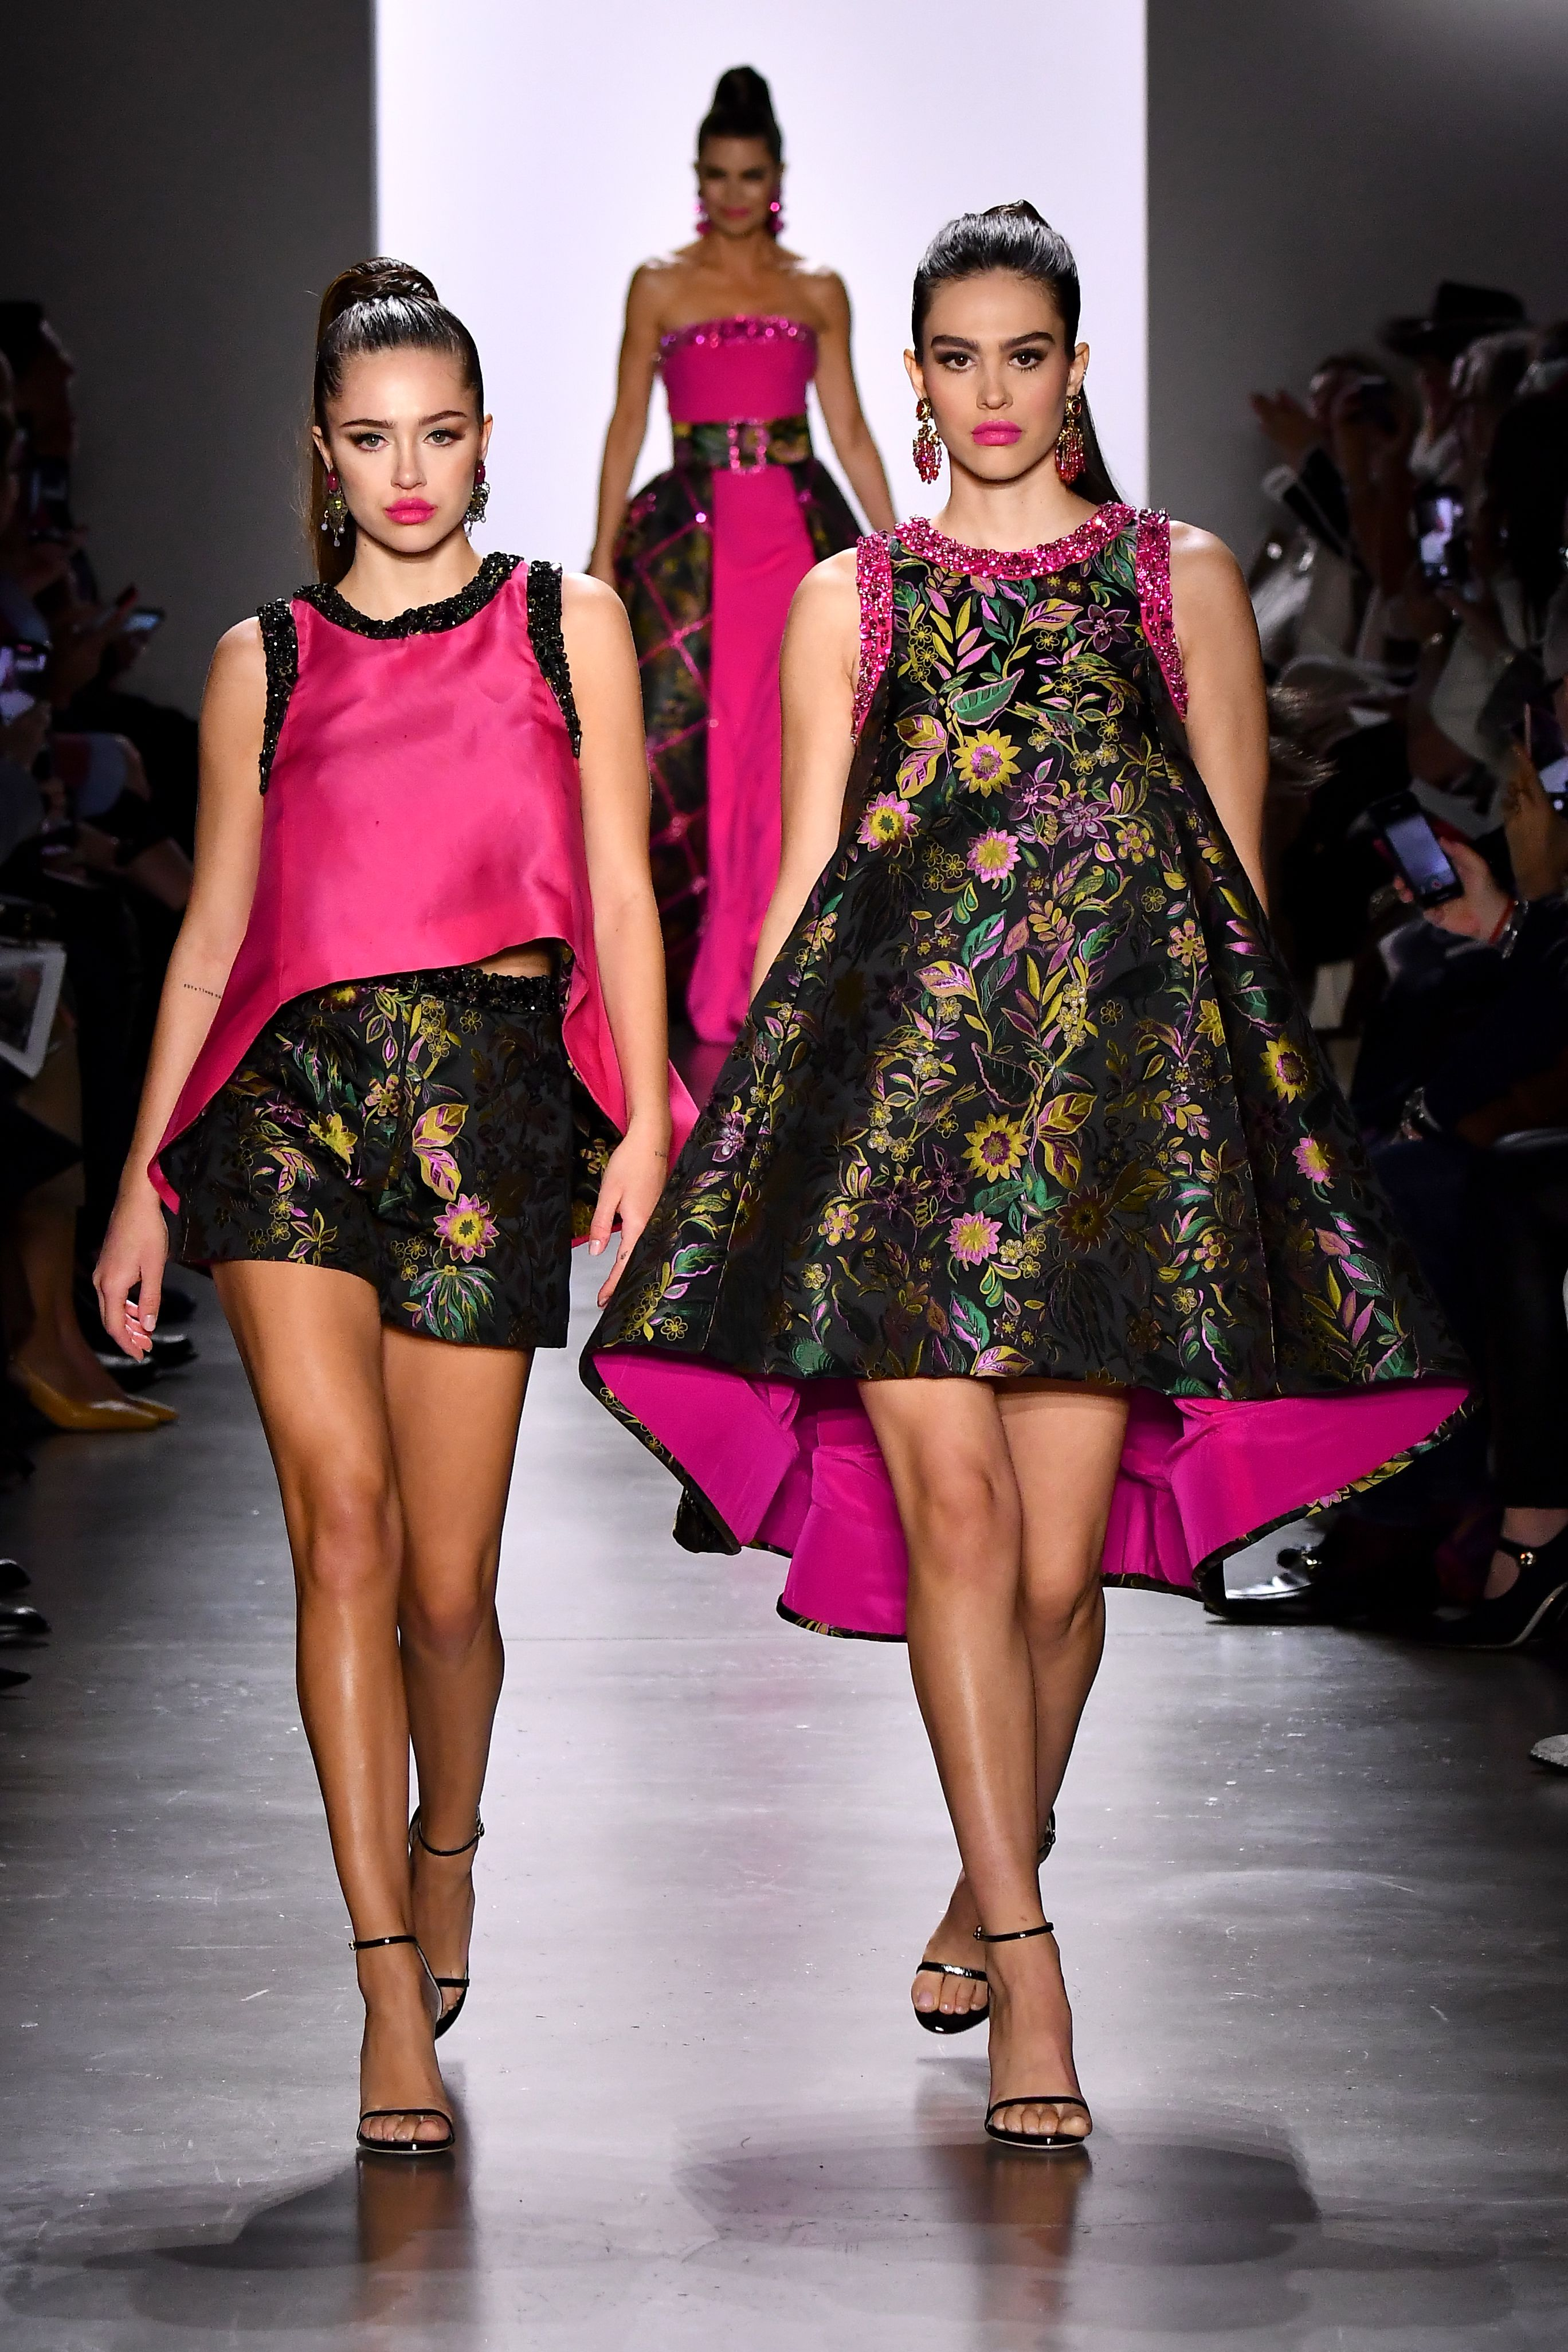 Delilah Hamlin and Amelia Gray Hamlin on the catwalkDennis Basso show, Runway, Fall Winter 2020, New York Fashion Week, USA - 09 Feb 2020